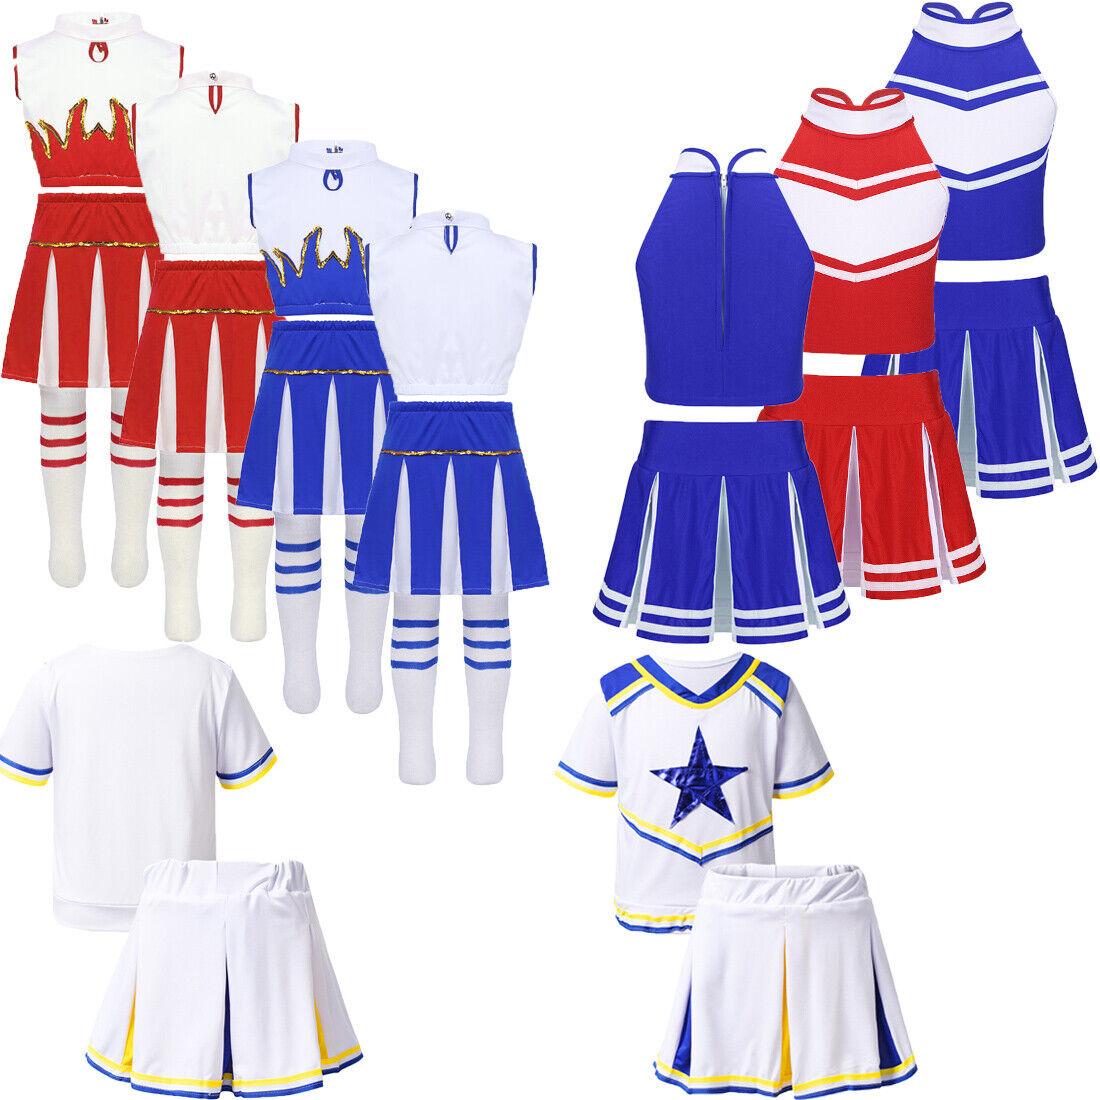 Girls Cheerleader Uniform Costume Dress Kids Tops+Skirt+Sock School Show Party